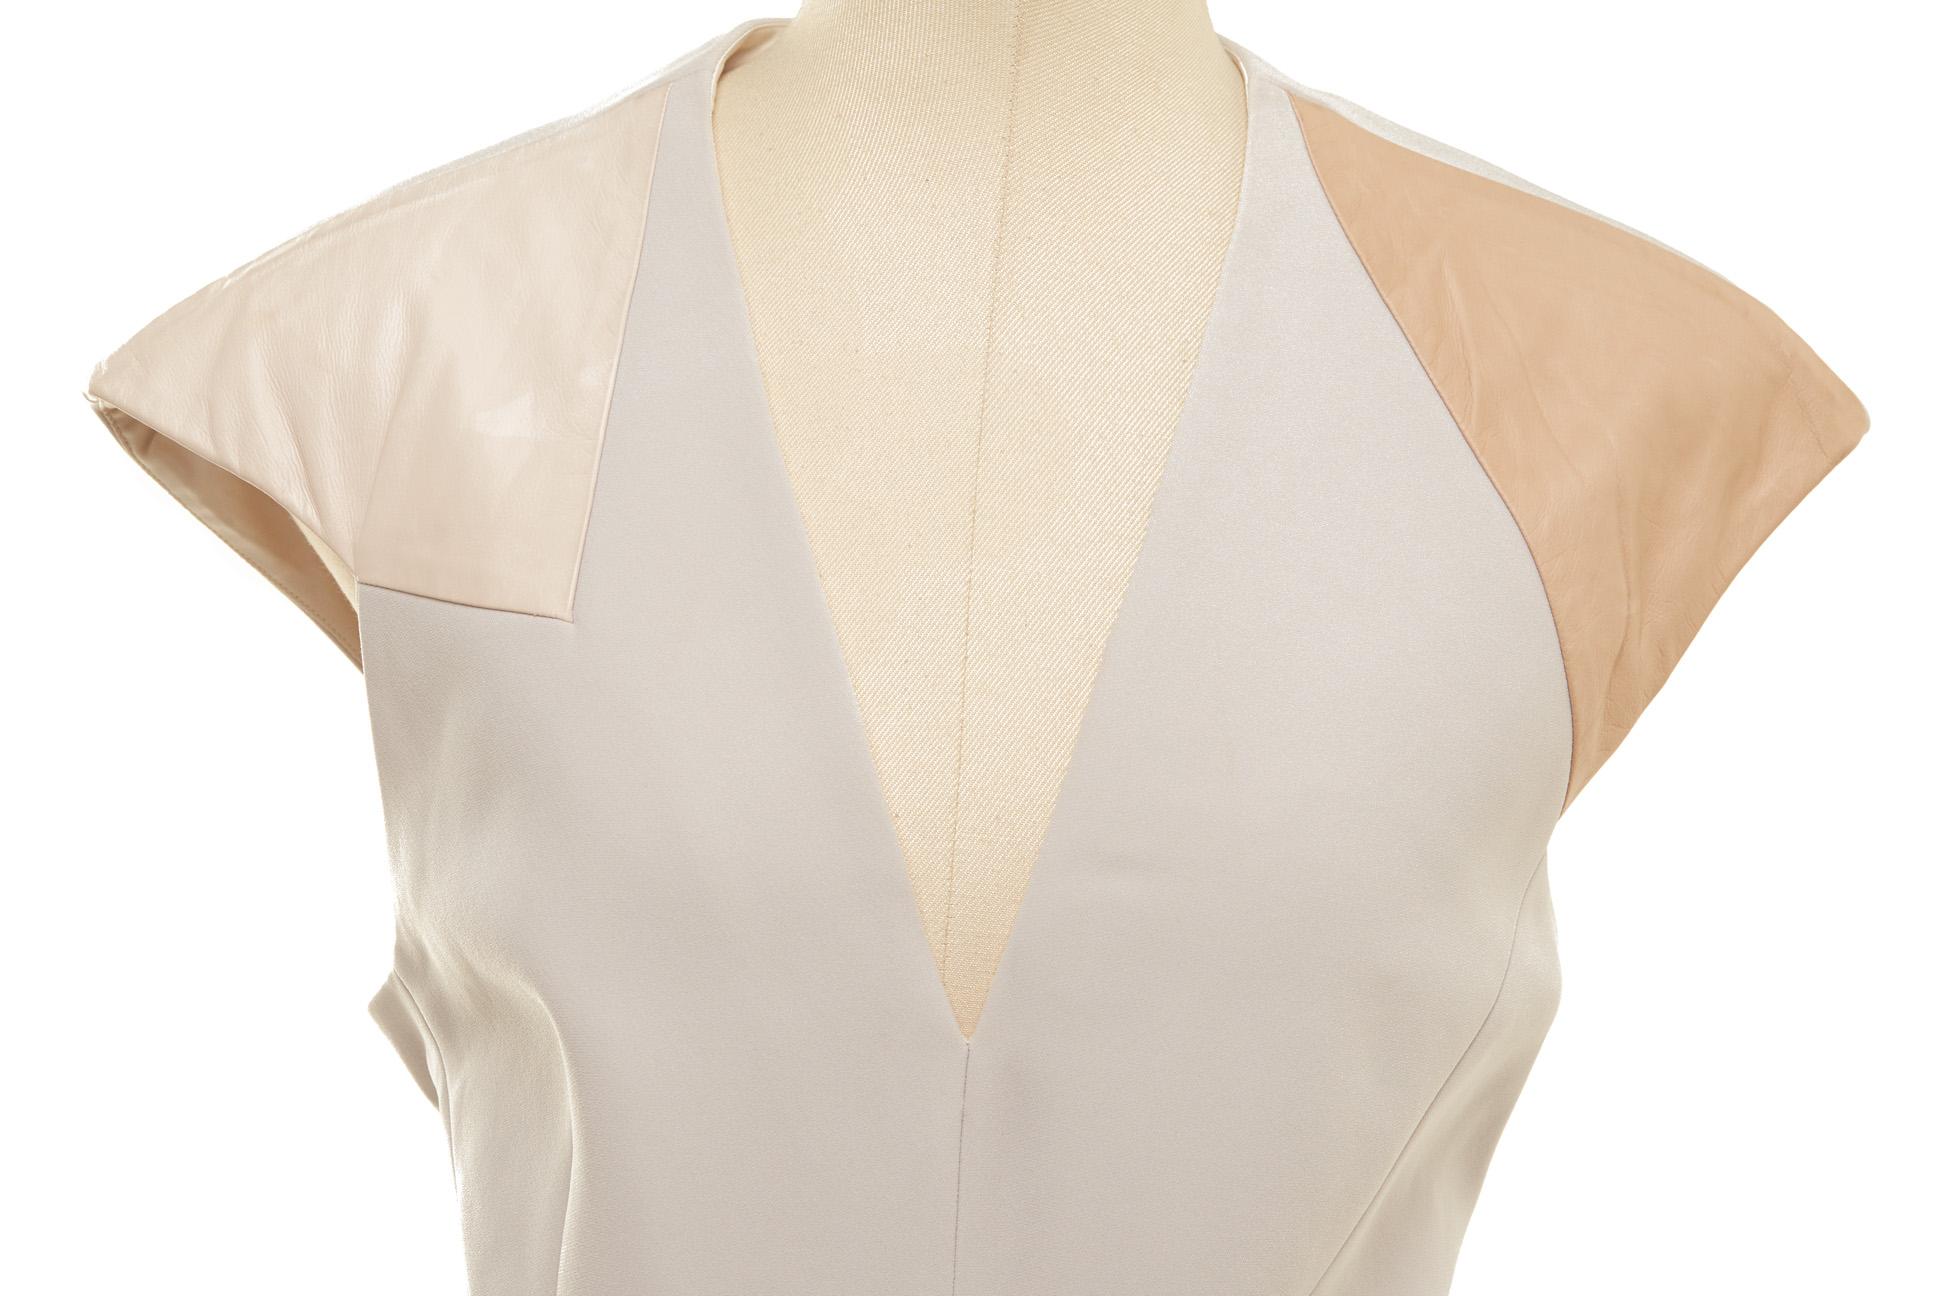 A BOTTEGA VENETA LIGHT GREY SHIFT DRESS - Image 2 of 3